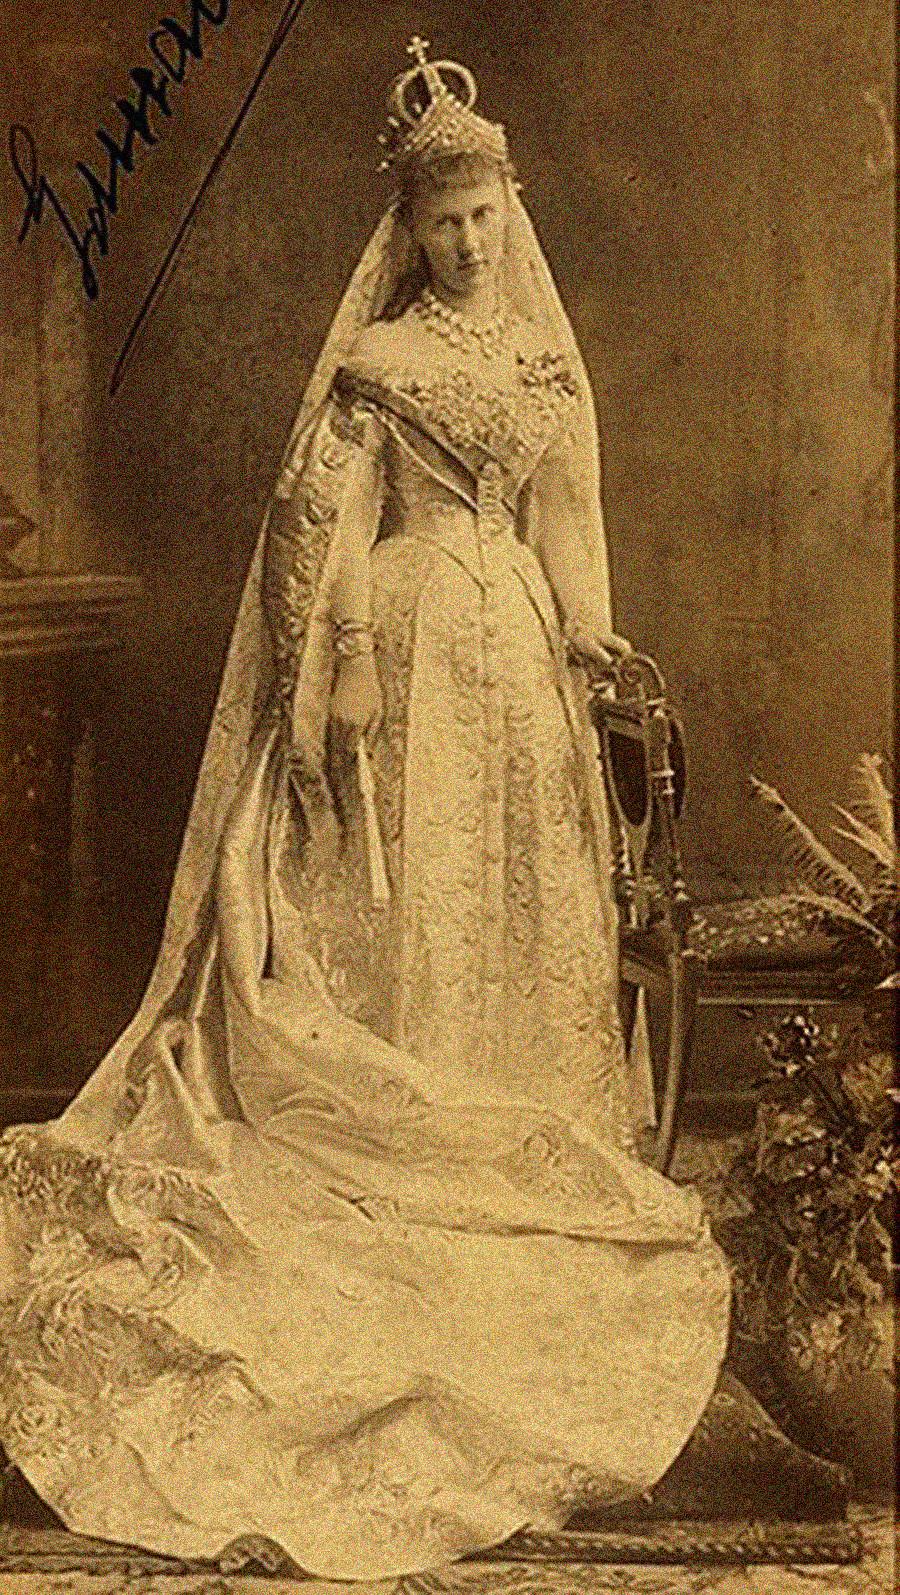 La granduchessa Elisabetta Mavrikievna, nipote di Nicola I, in abito da sposa, 1884